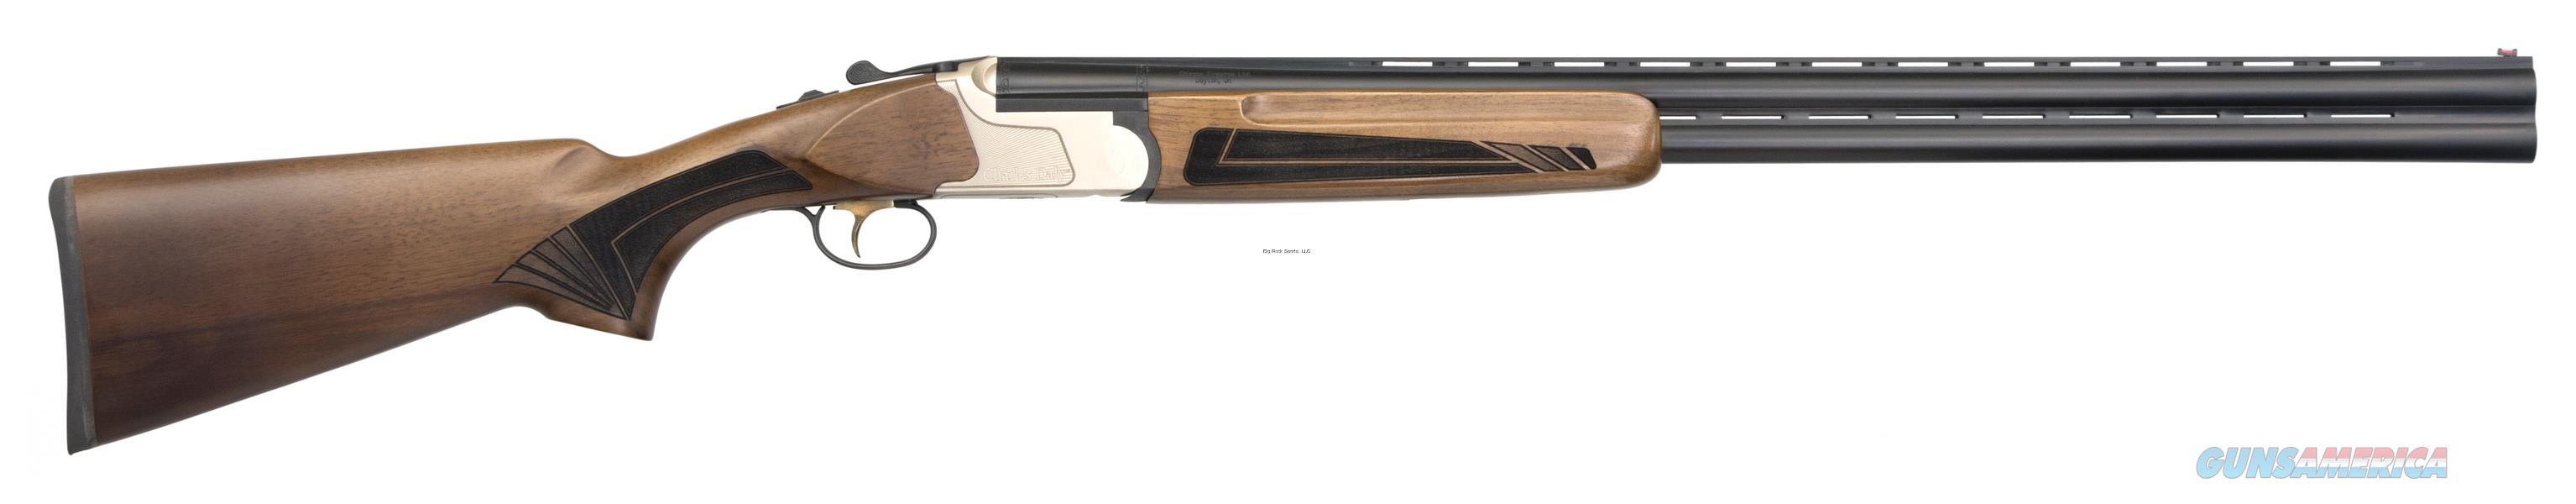 "Chiappa Firearms 202 O/U Shotgun,20 Ga 3"", White, 26"" Bbl, Ejector, Mobil Choke Thread Pattern, Walnut Stock, Single Selective Trigger 930.131  Guns > Shotguns > C Misc Shotguns"